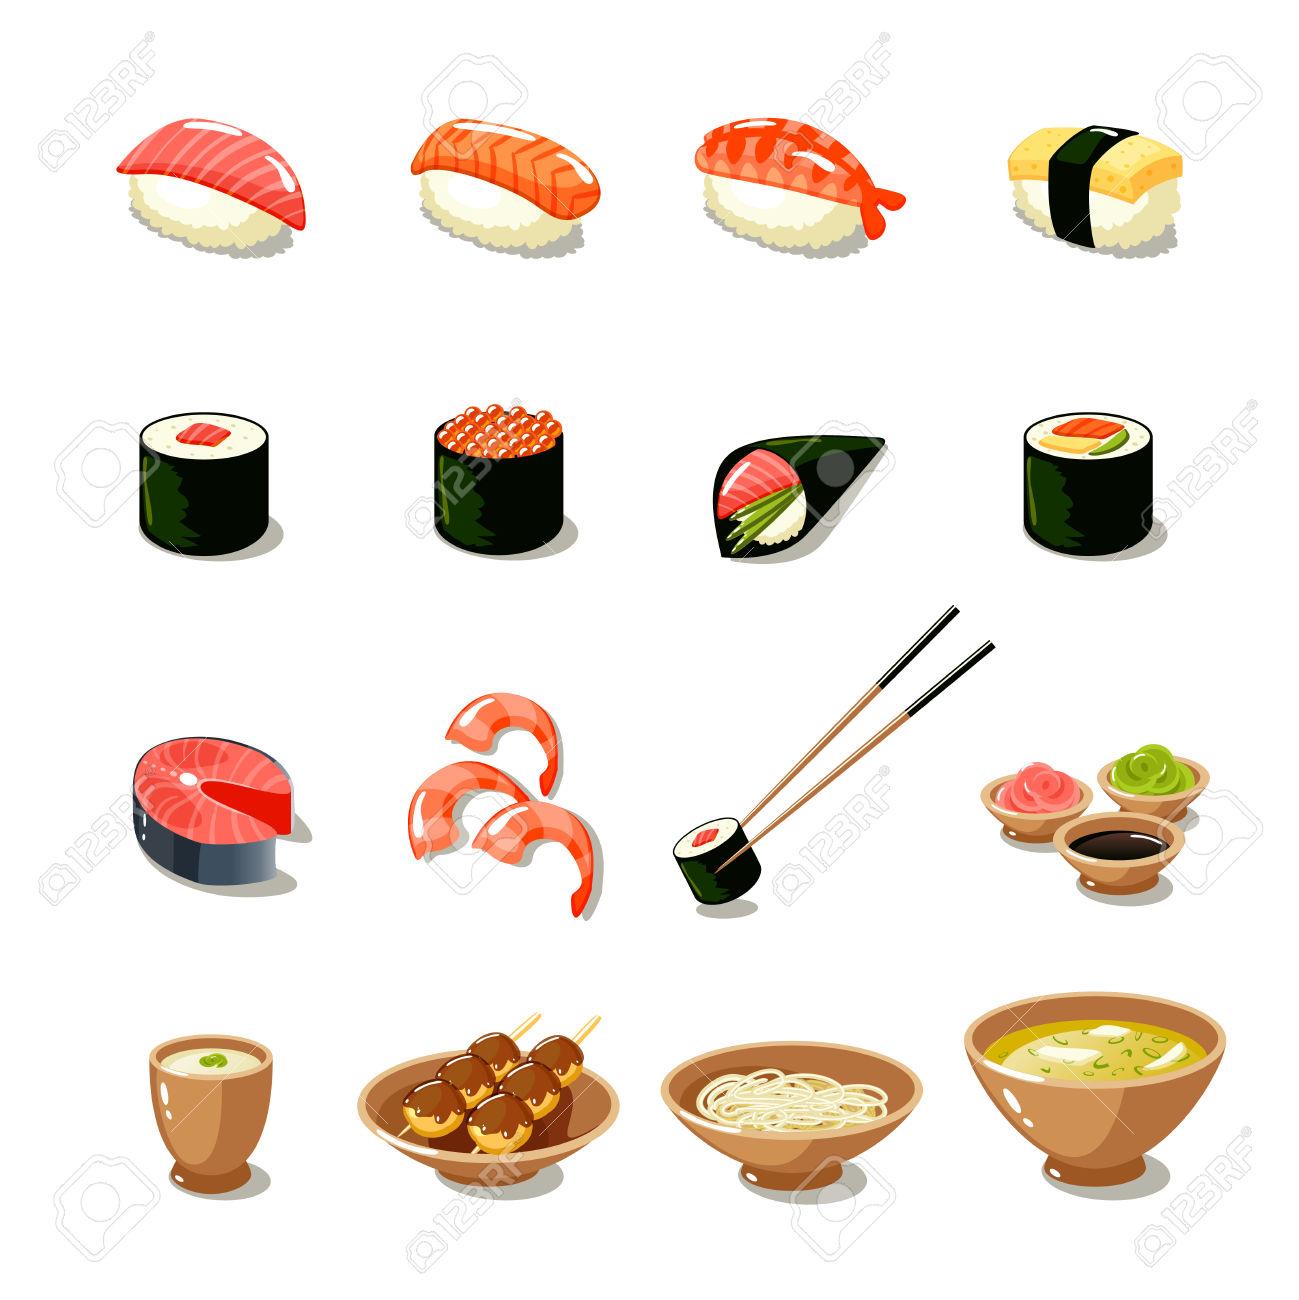 4,113 Sashimi Stock Vector Illustration And Royalty Free Sashimi.